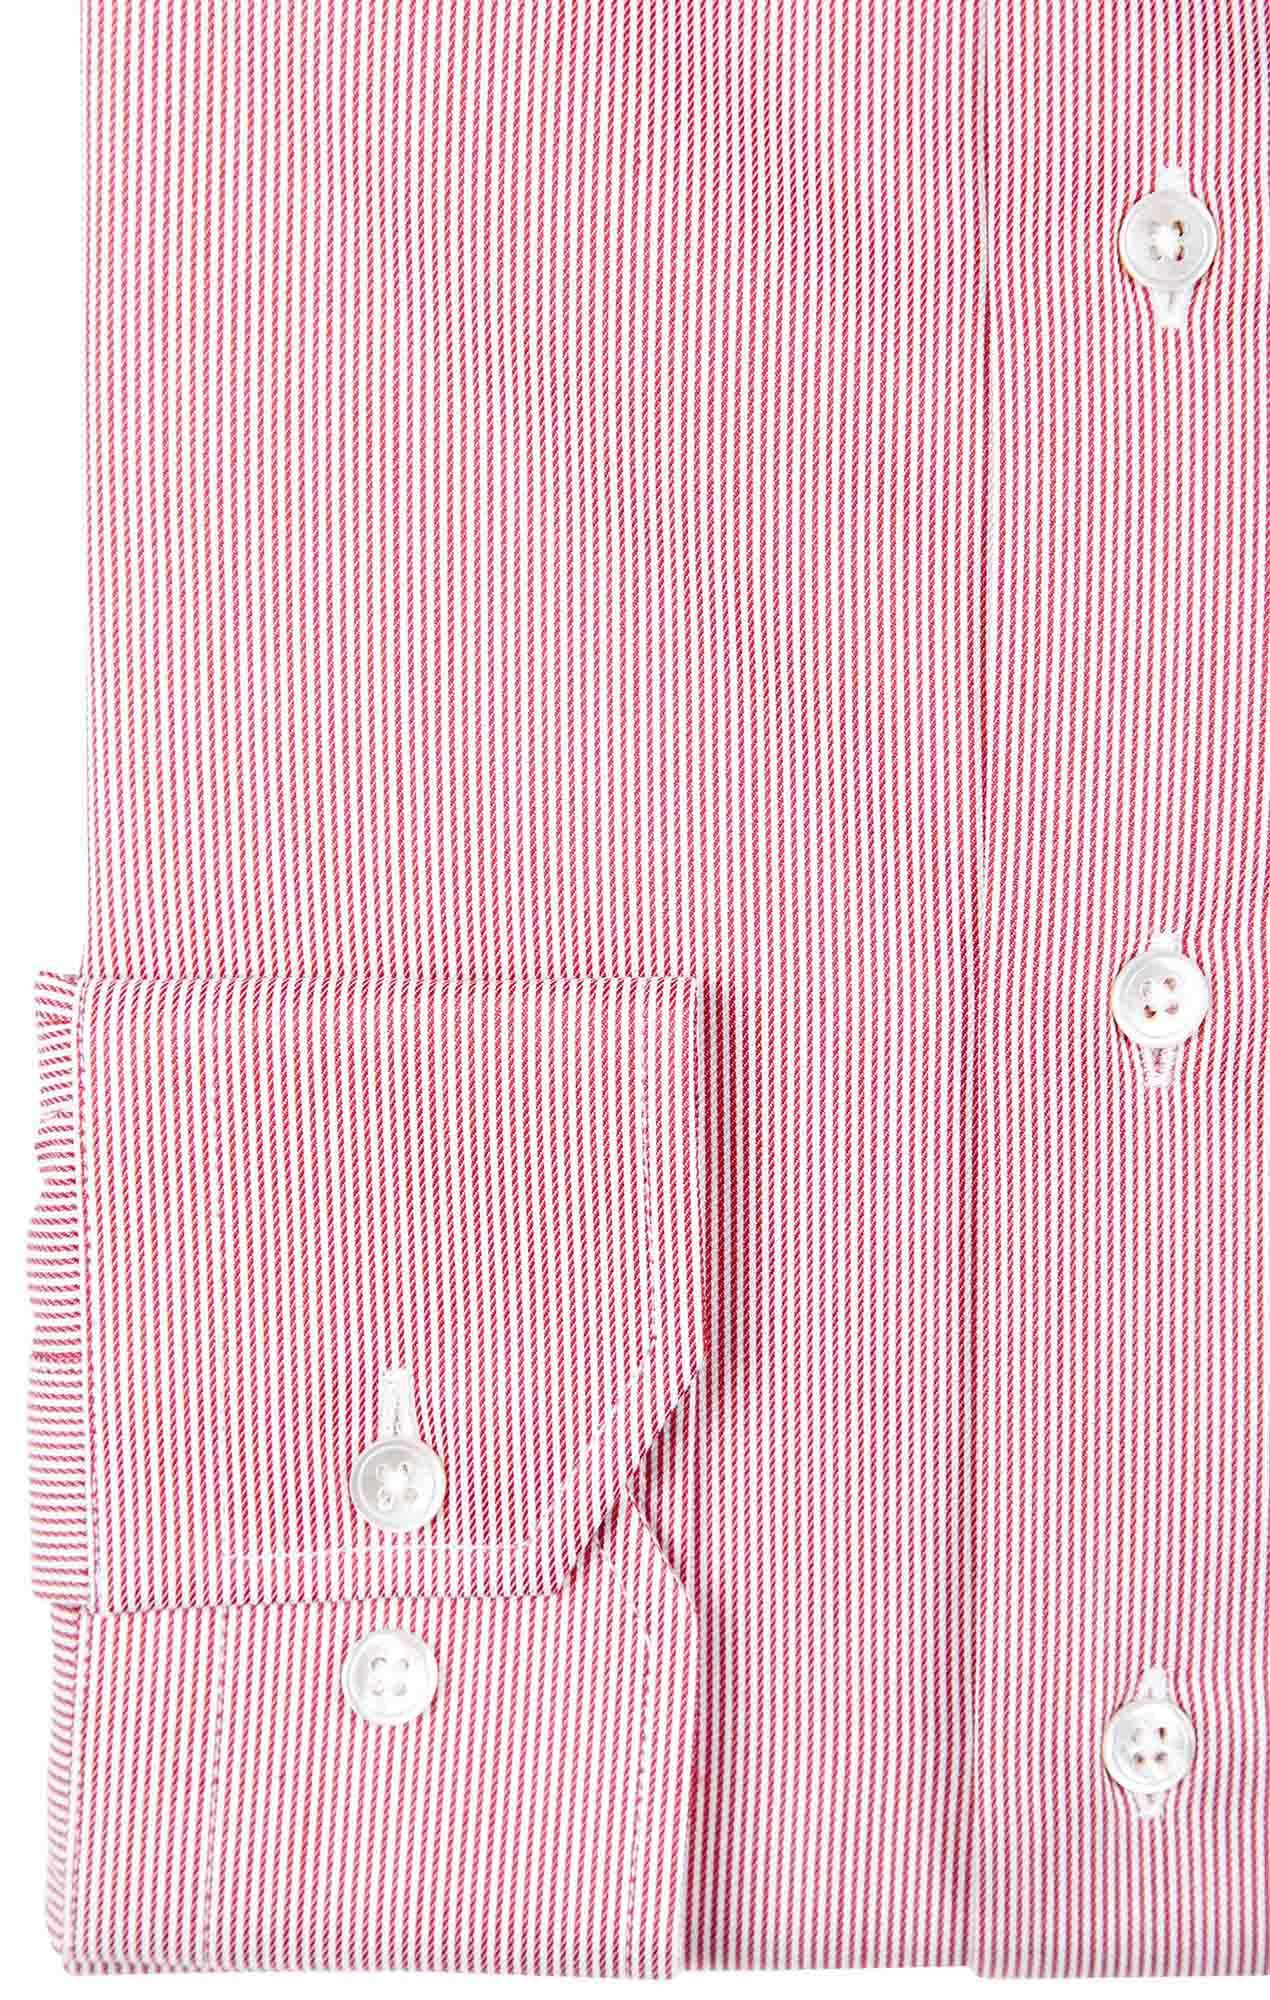 Chemise rayée rouge twill Les chemises